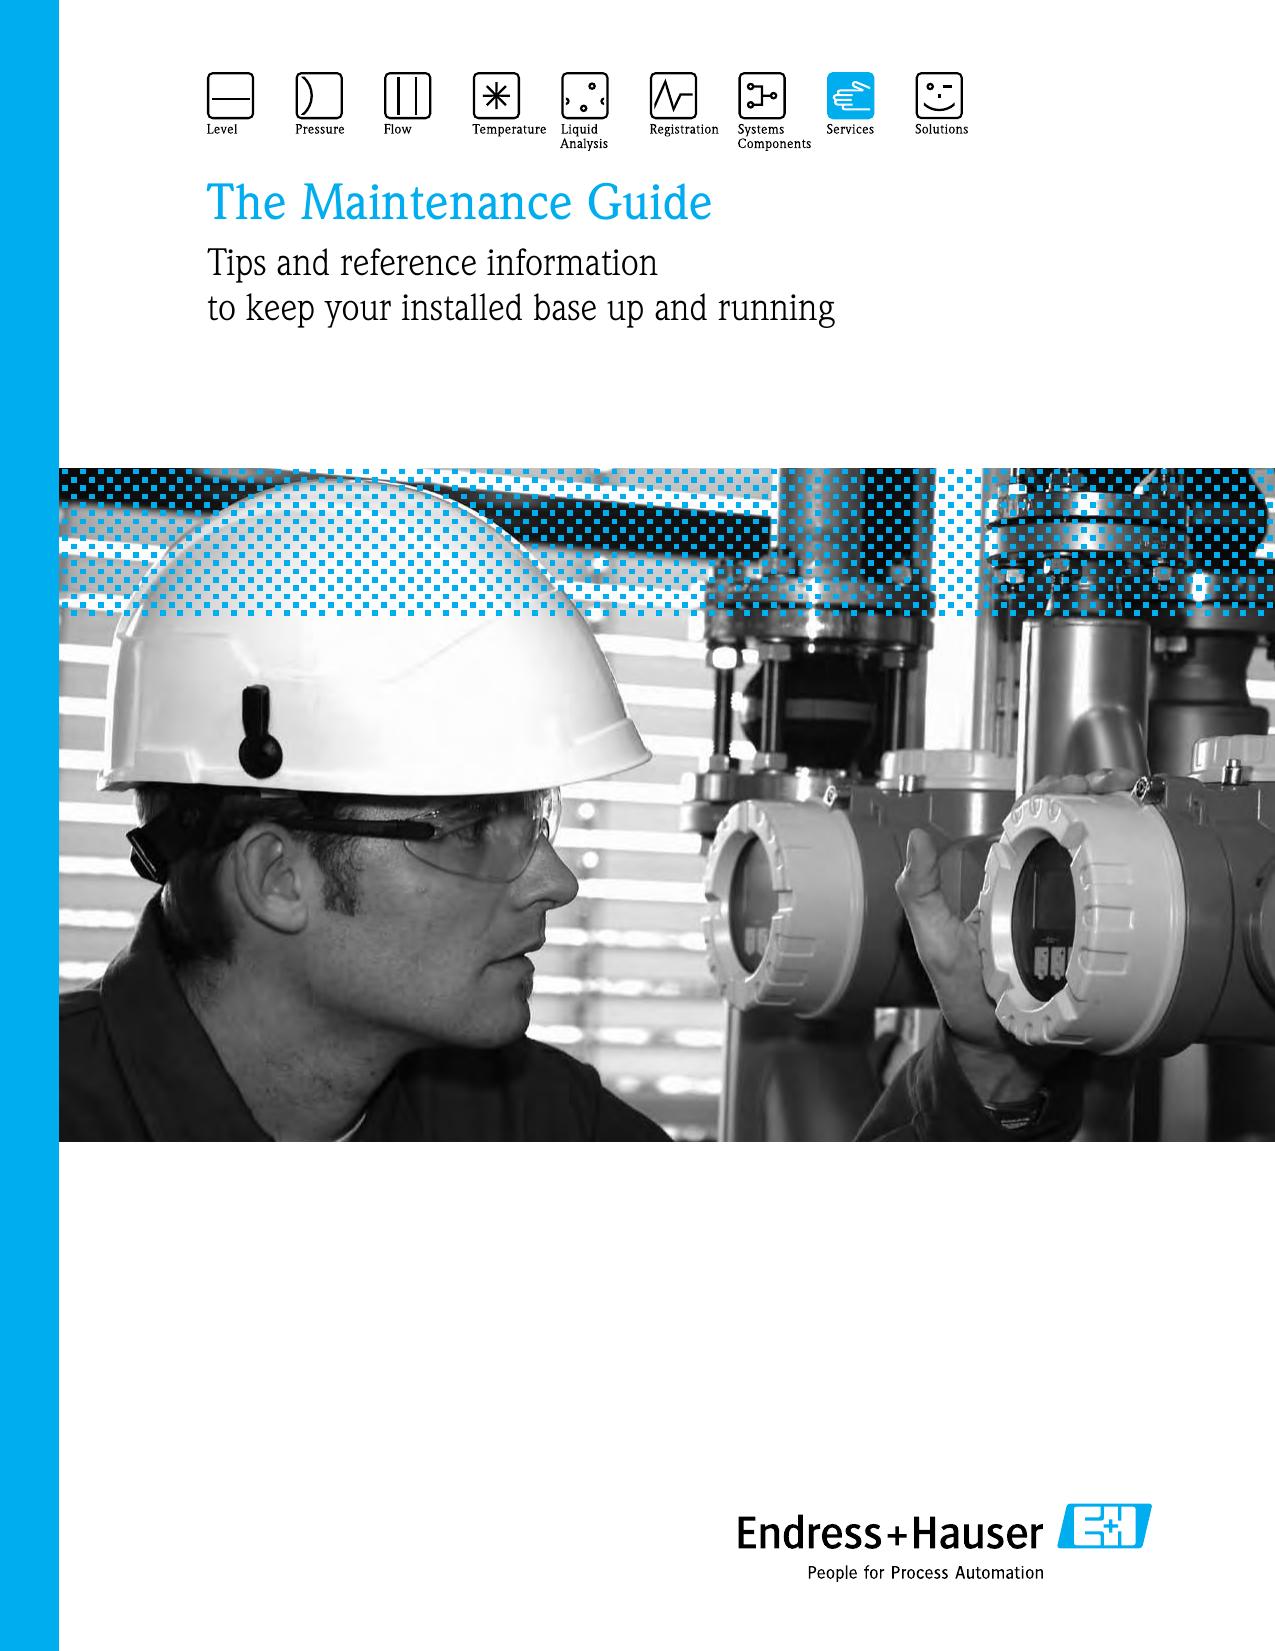 The Maintenance Guide - Endress+Hauser Portal | manualzz com